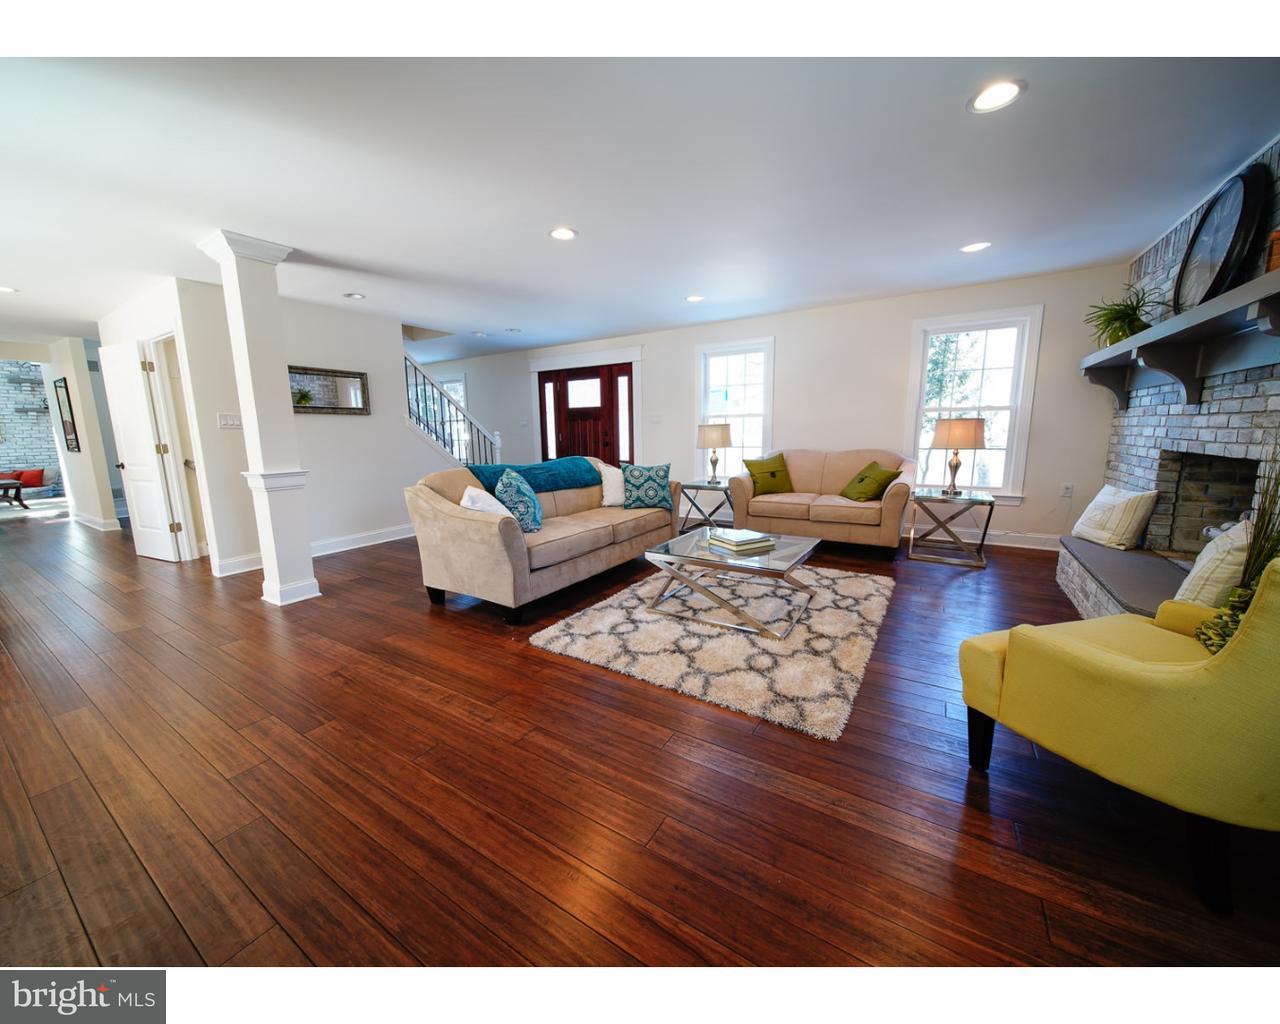 4915 NEW RD, BUCKINGHAM - Listed at $4,000, BUCKINGHAM